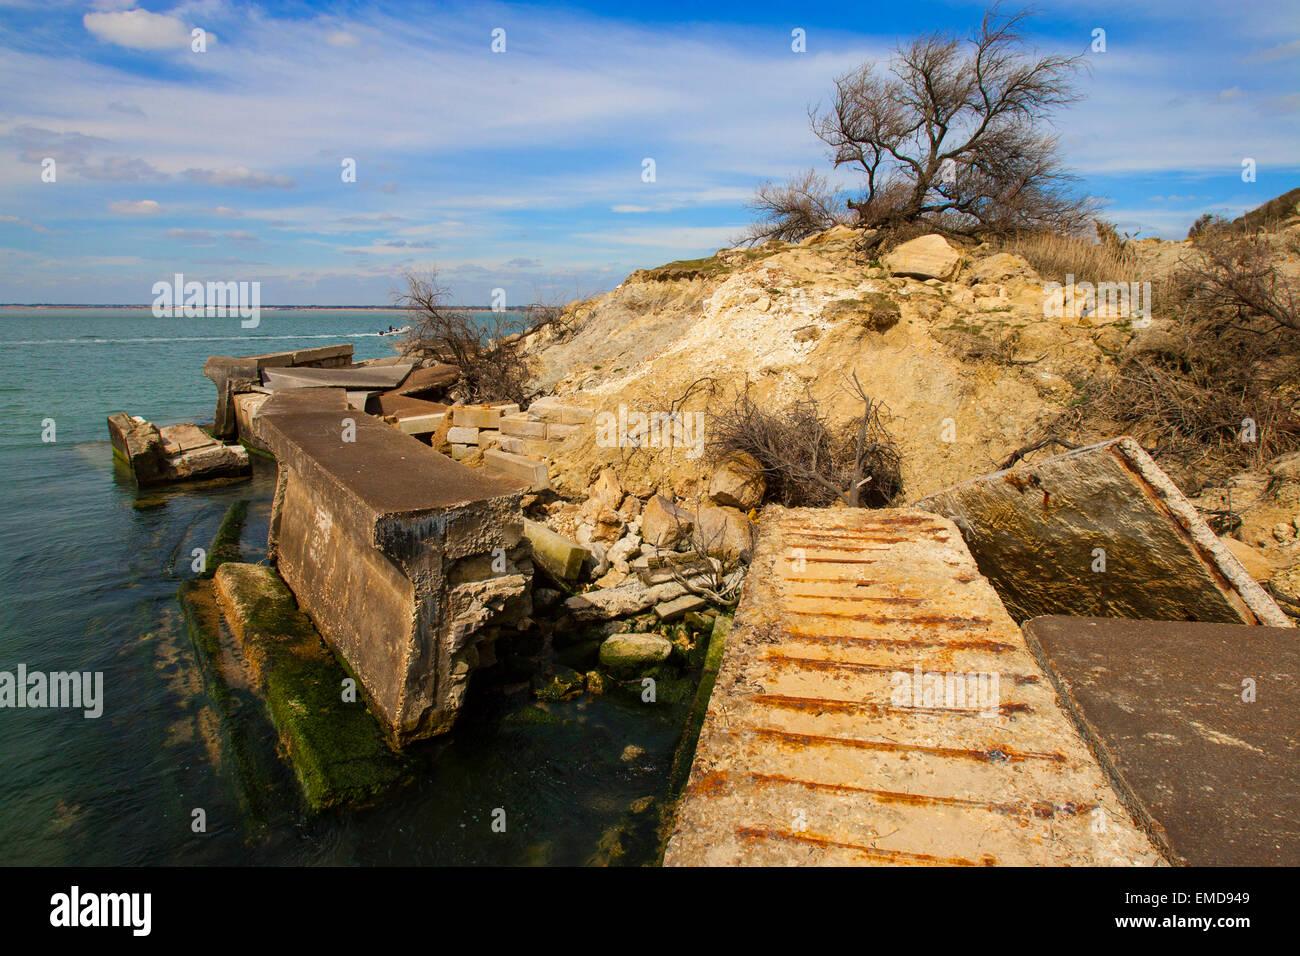 destroyed footpath, earth, rock, large landslip, erosion, Totland Bay, The Needles, Isle of Wight, England, UK - Stock Image